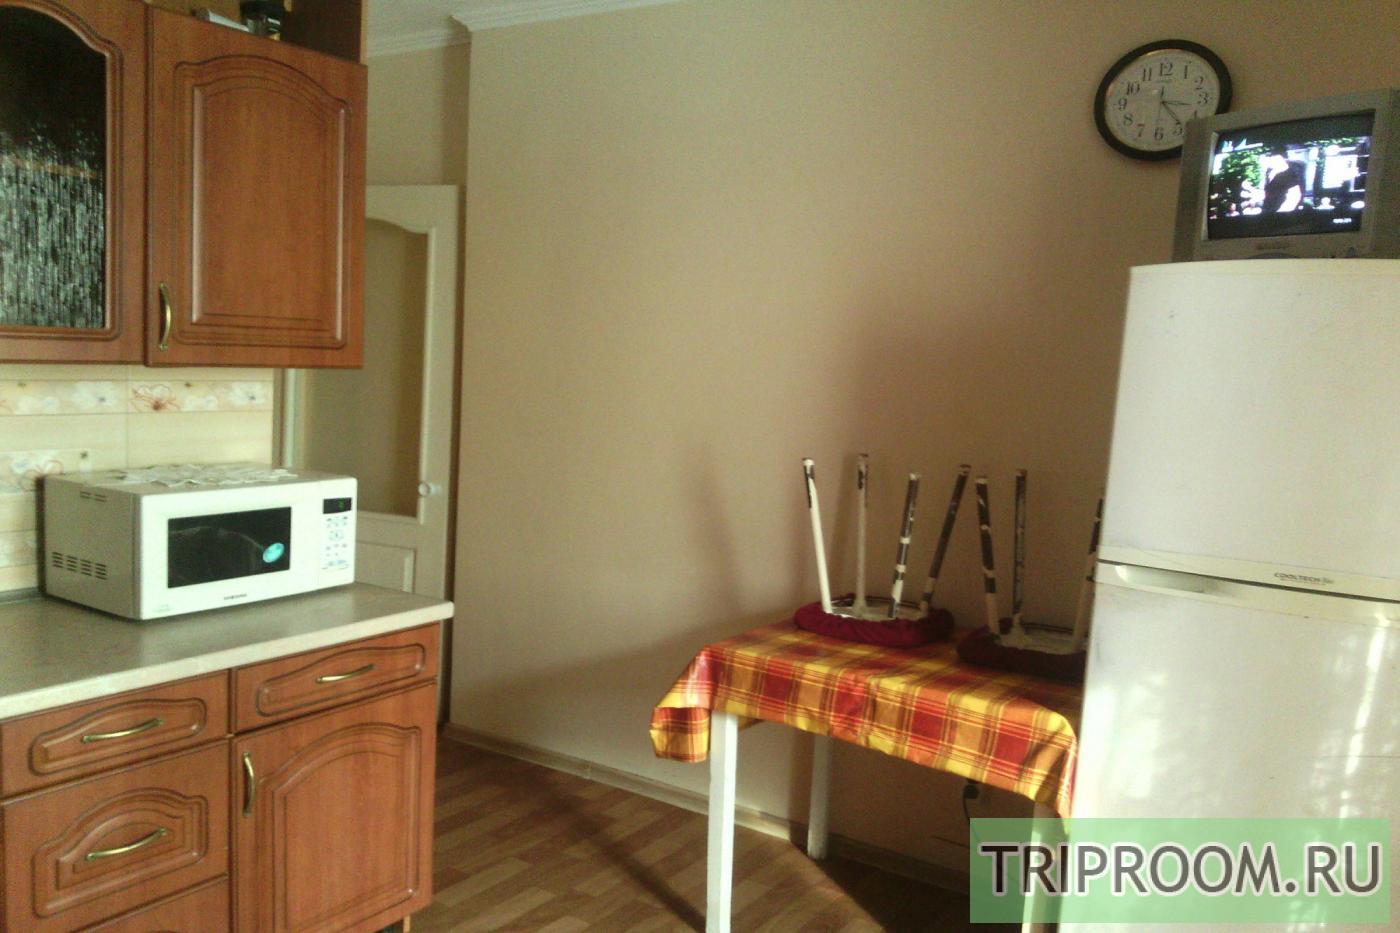 1-комнатная квартира посуточно (вариант № 33678), ул. Флегонтова улица, фото № 2